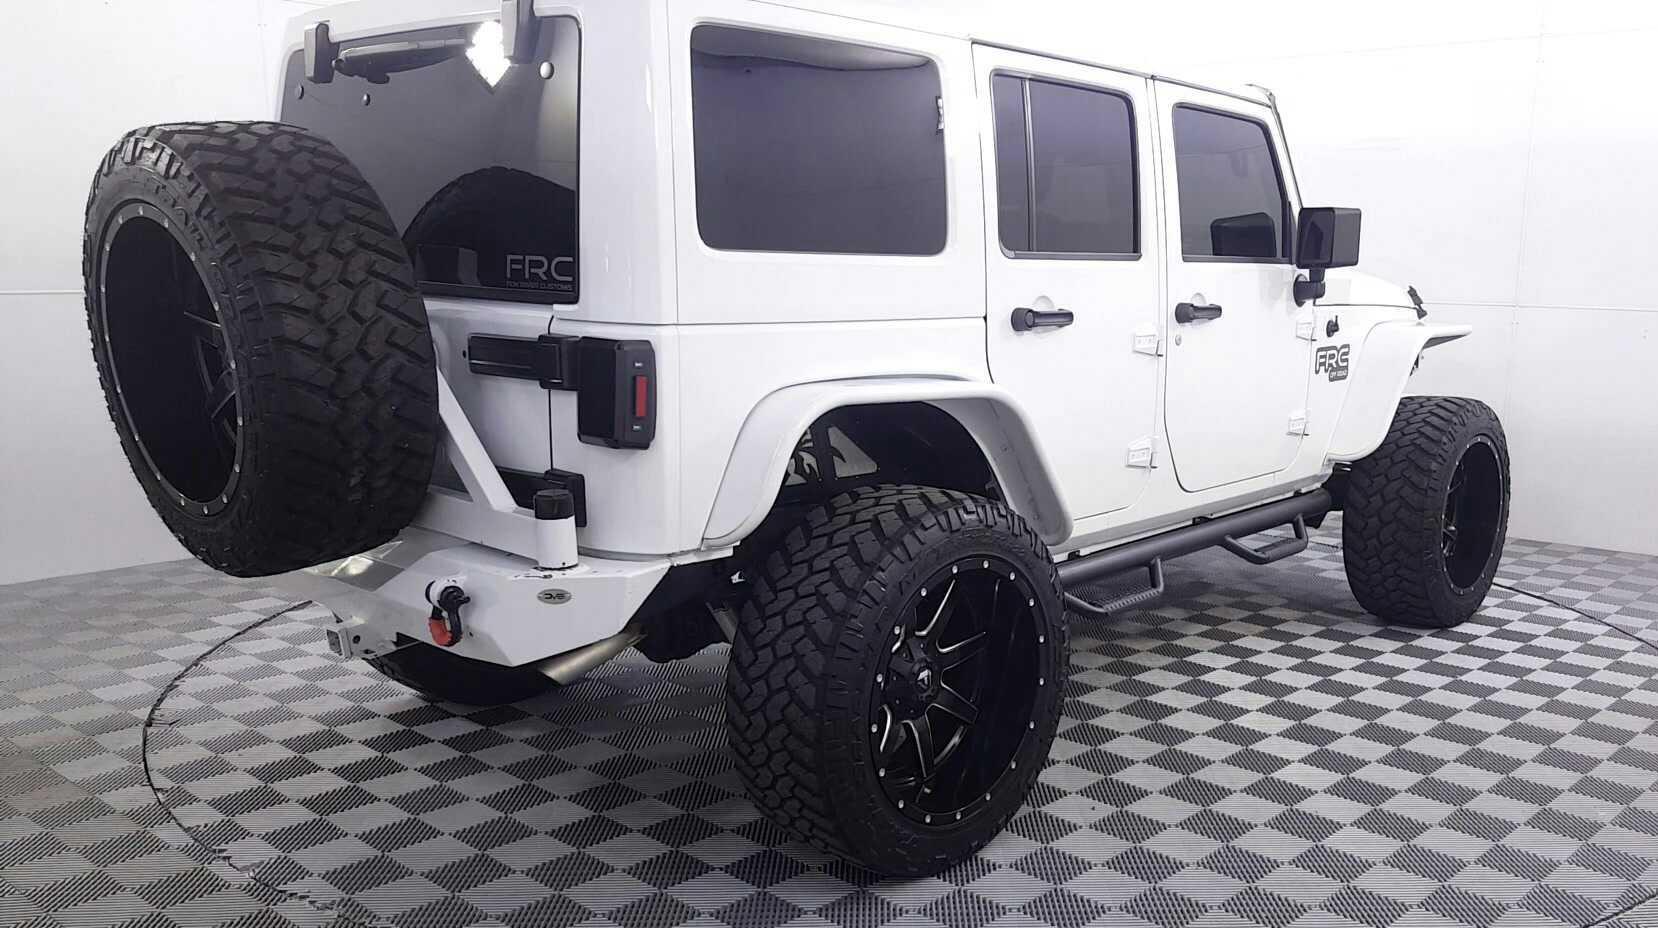 2017 Jeep Wrangler Unlimited Sahara FRC KIT - Jidd Motors